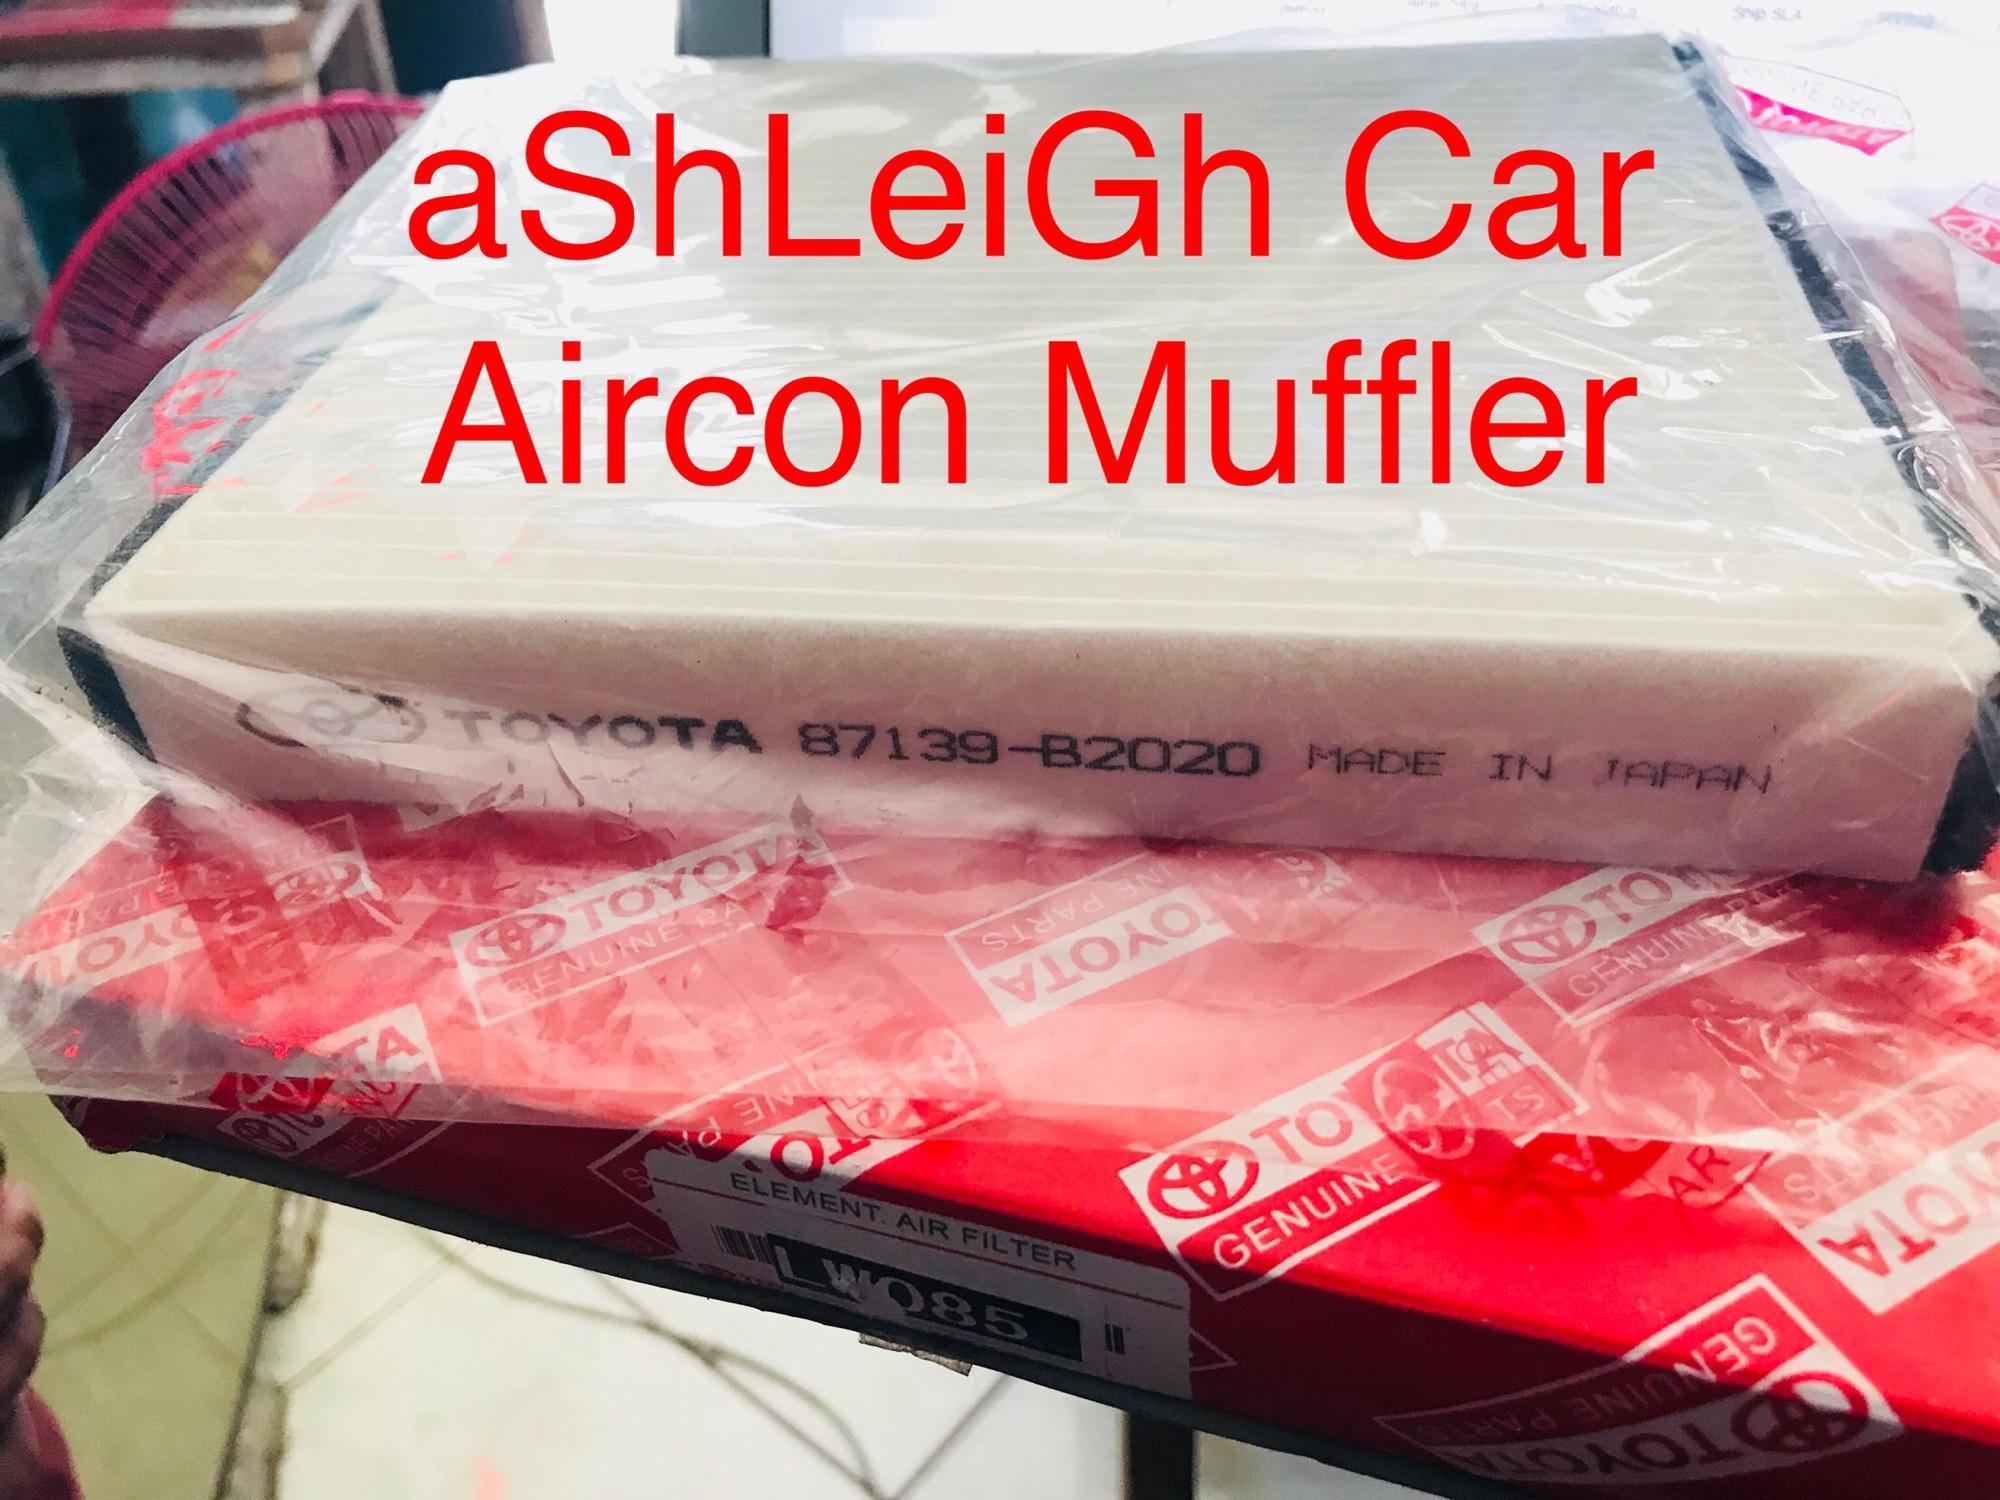 Car Air Conditioning For Sale Auto Online Brands Toyota Rav4 Temp Gauge Wiring Wigo Original Cabin Filter Aircon Parts